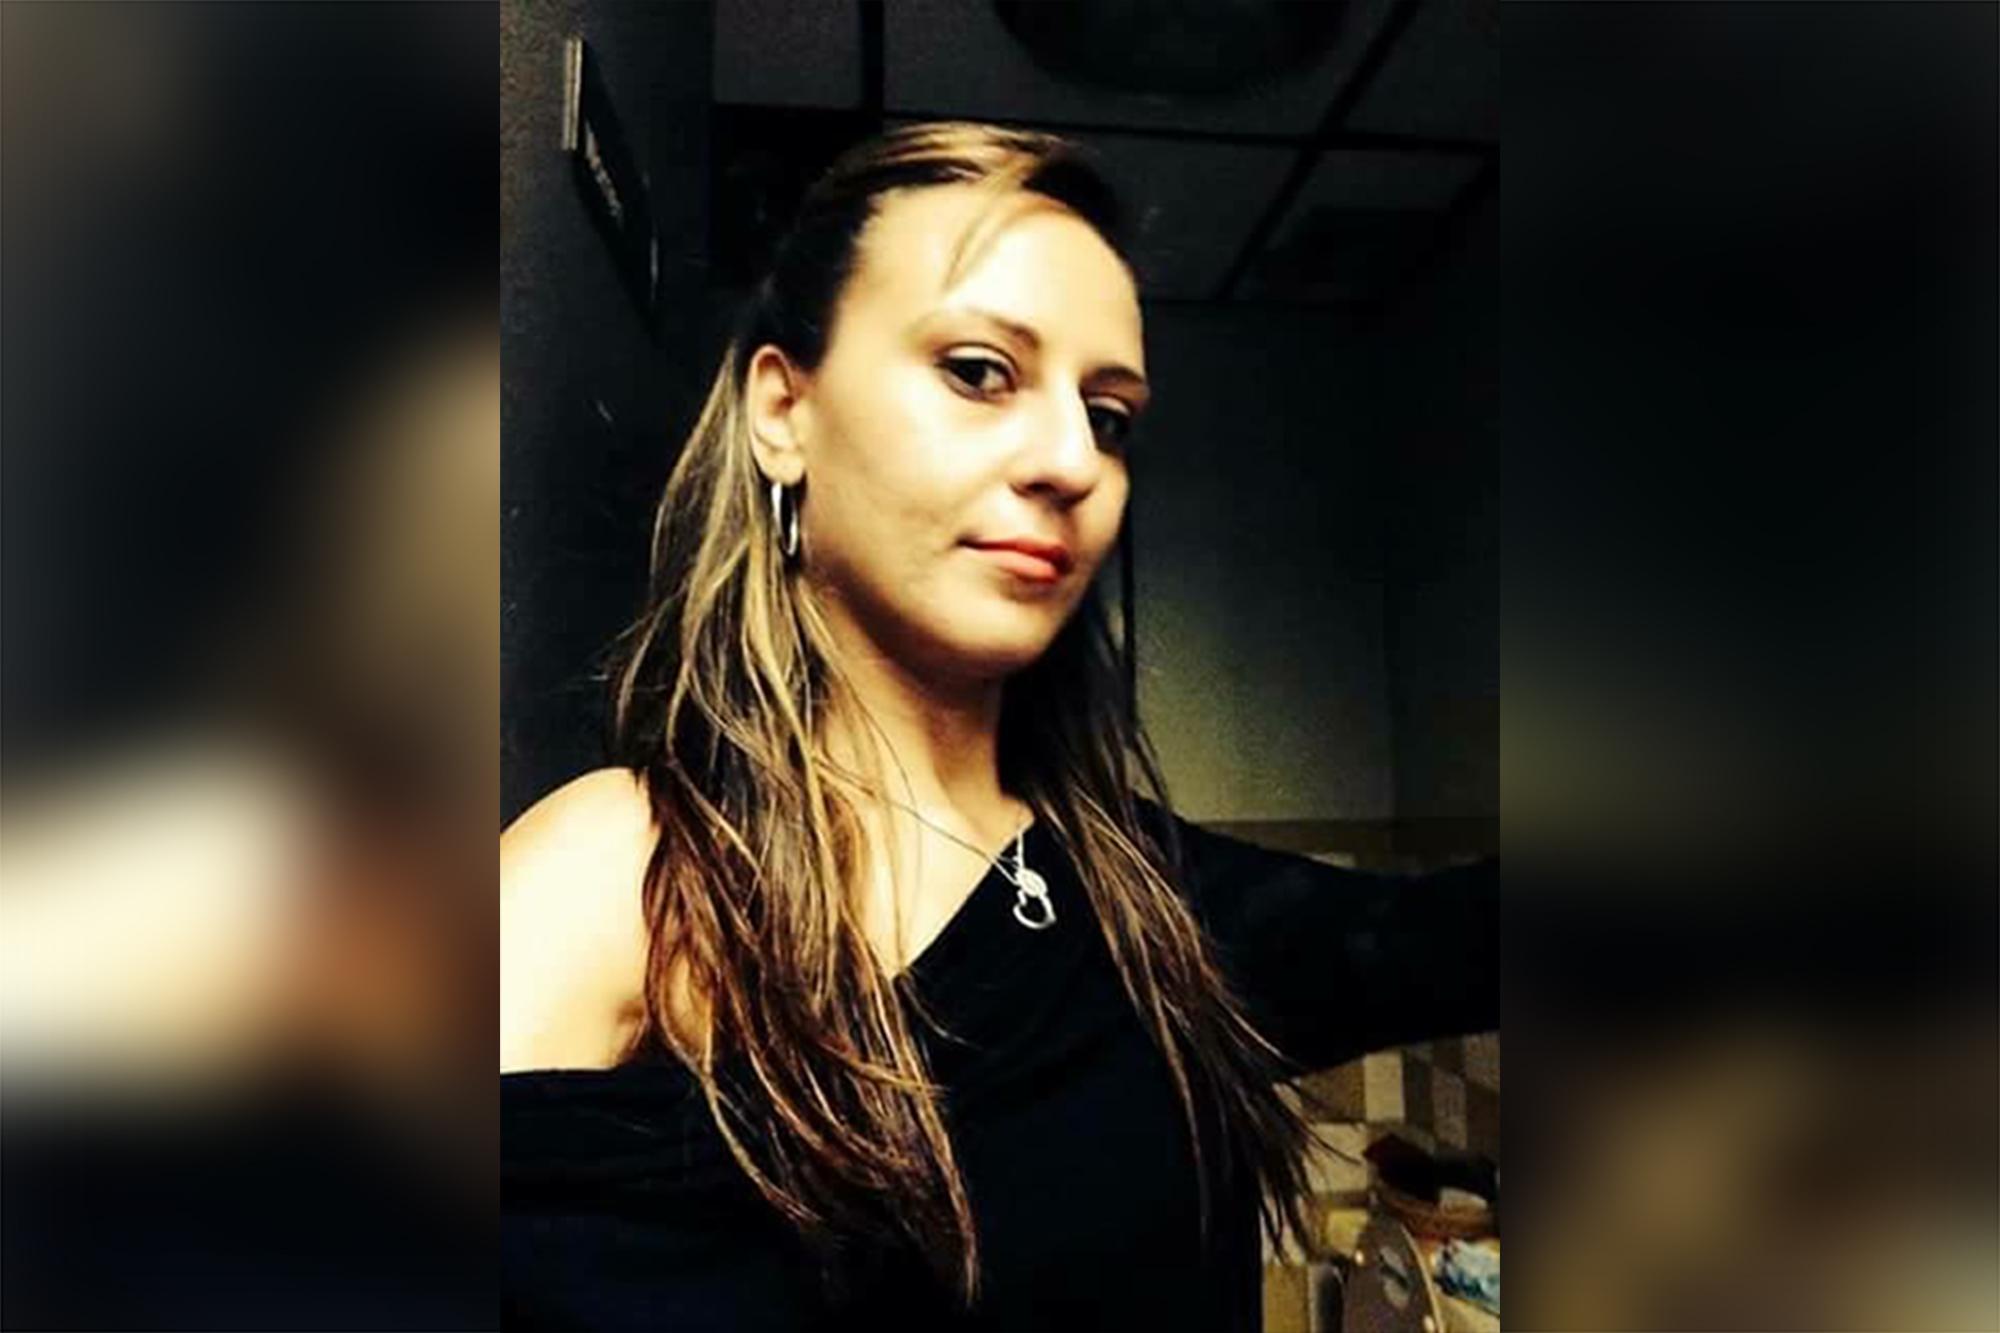 Earlier victim recounts run-in with Rick Moranis attacker